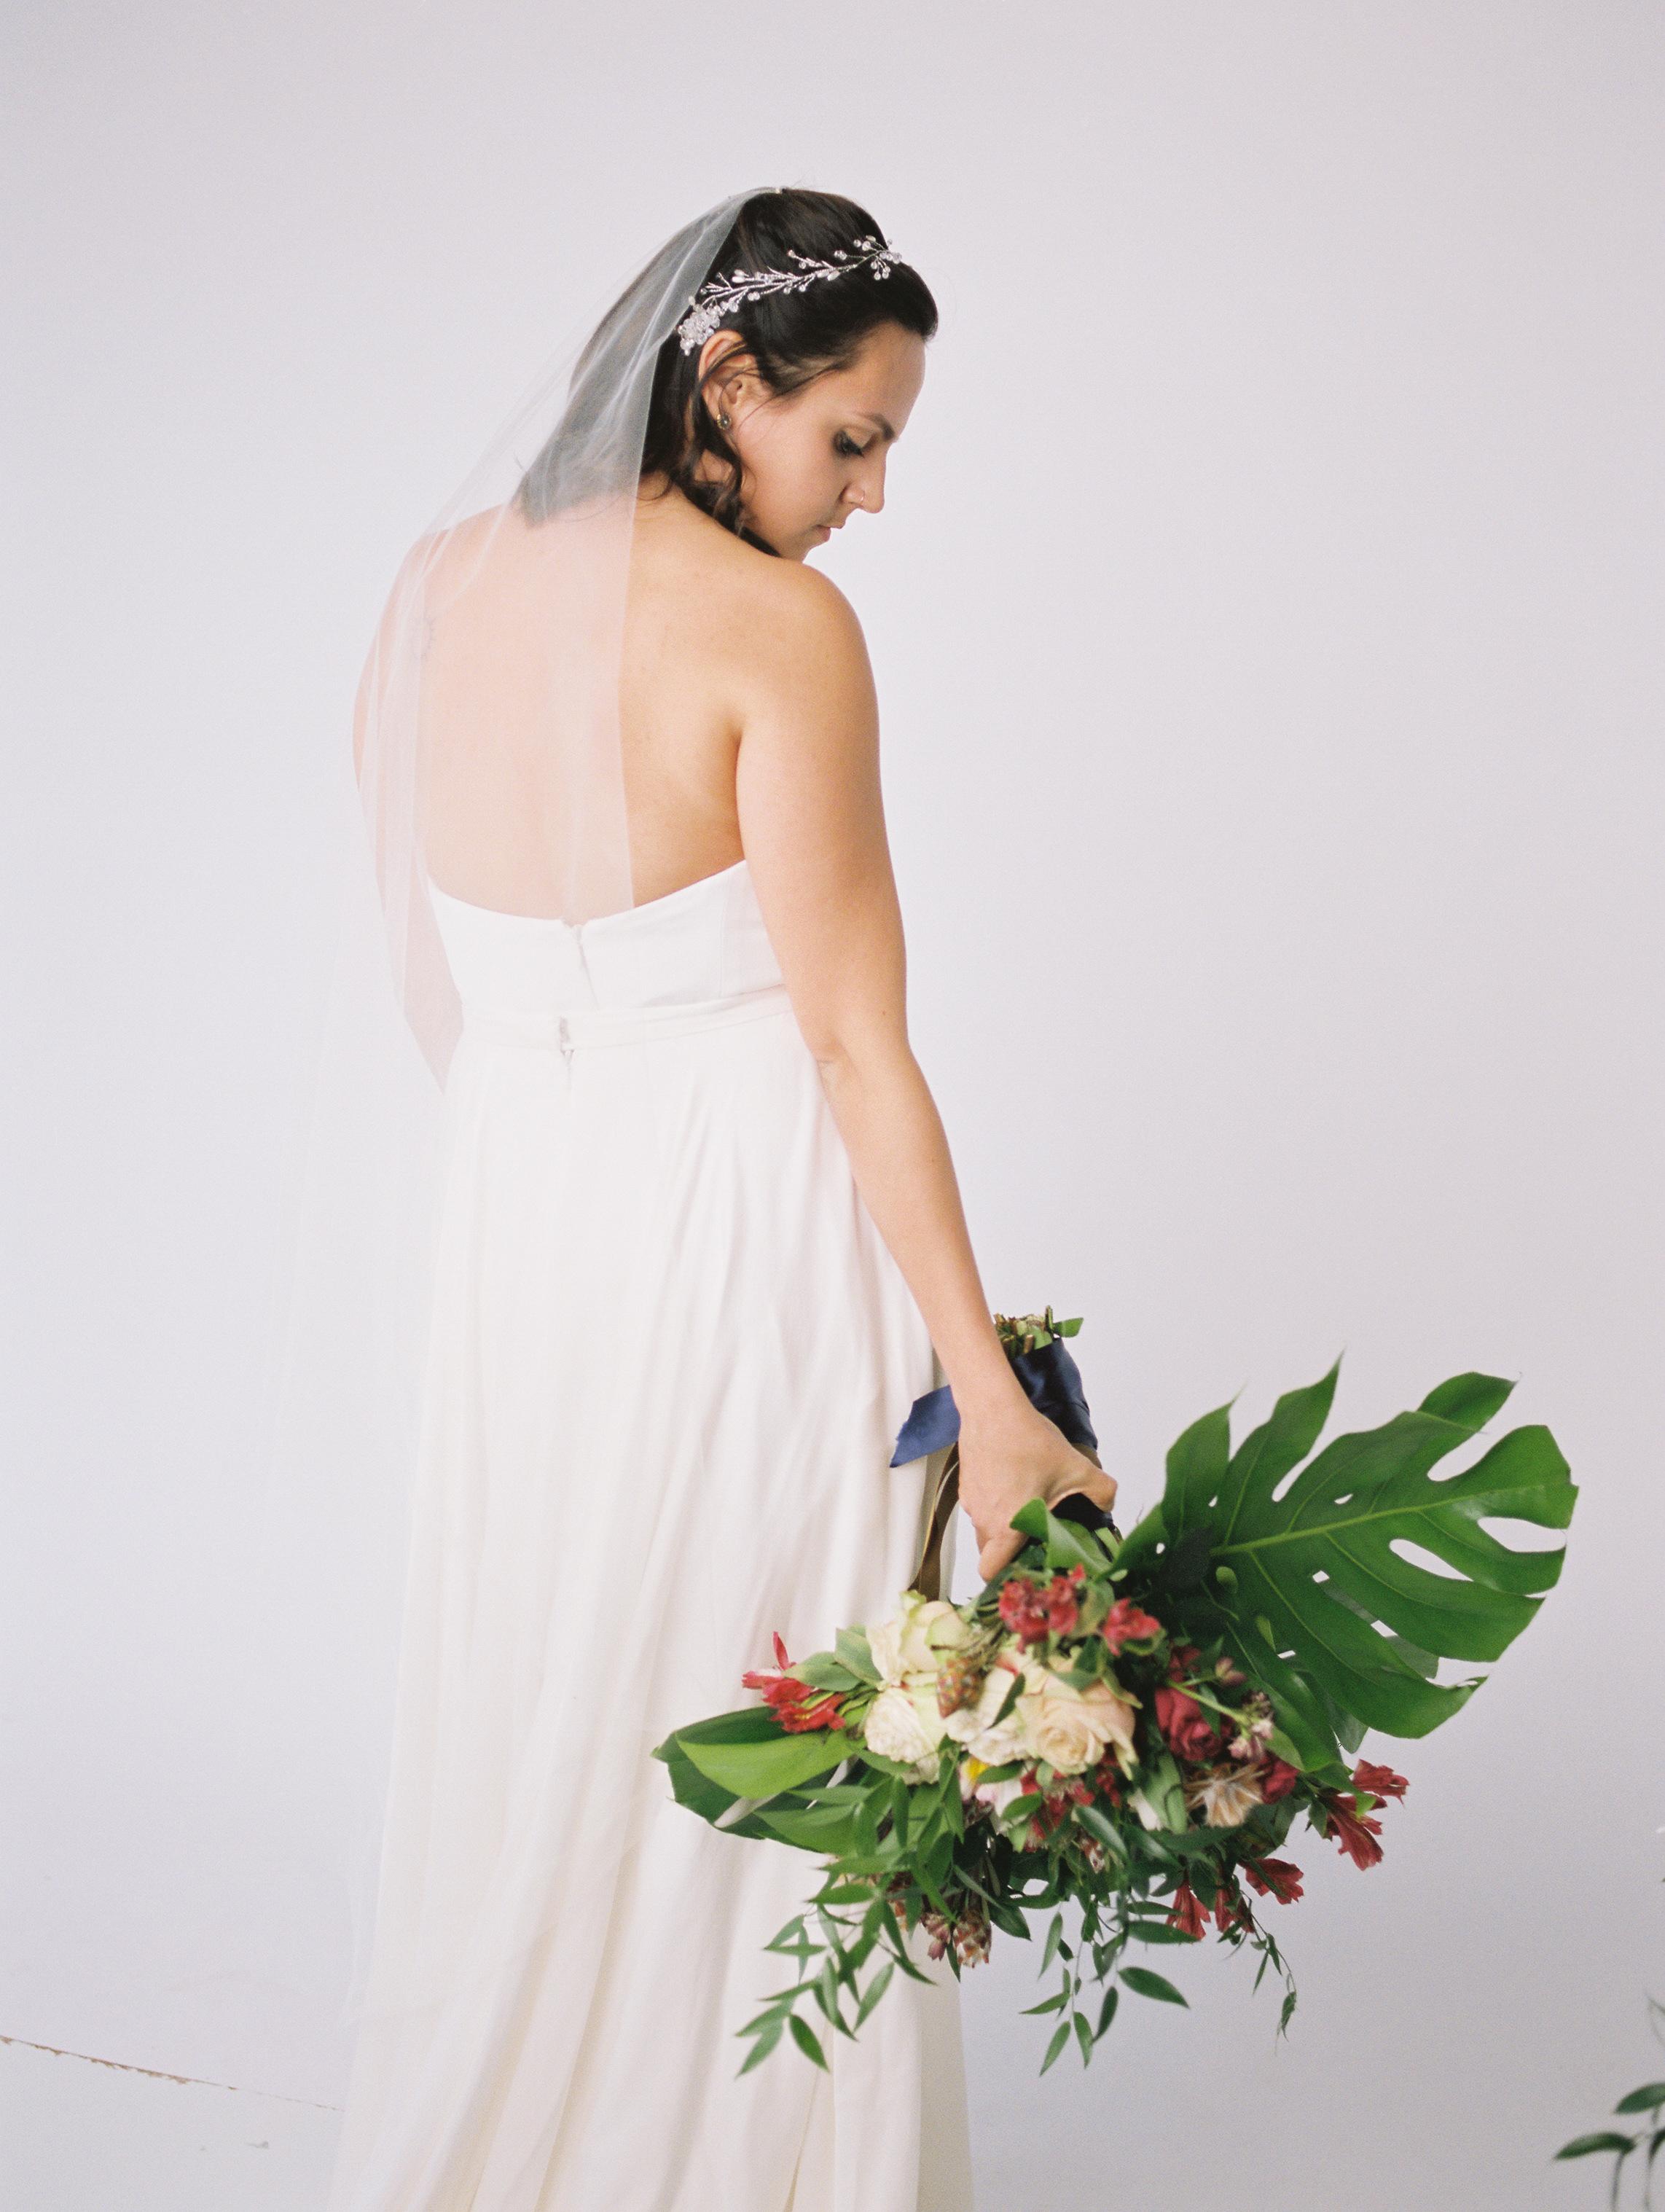 Rappaport-hannah-bridal-22.jpg